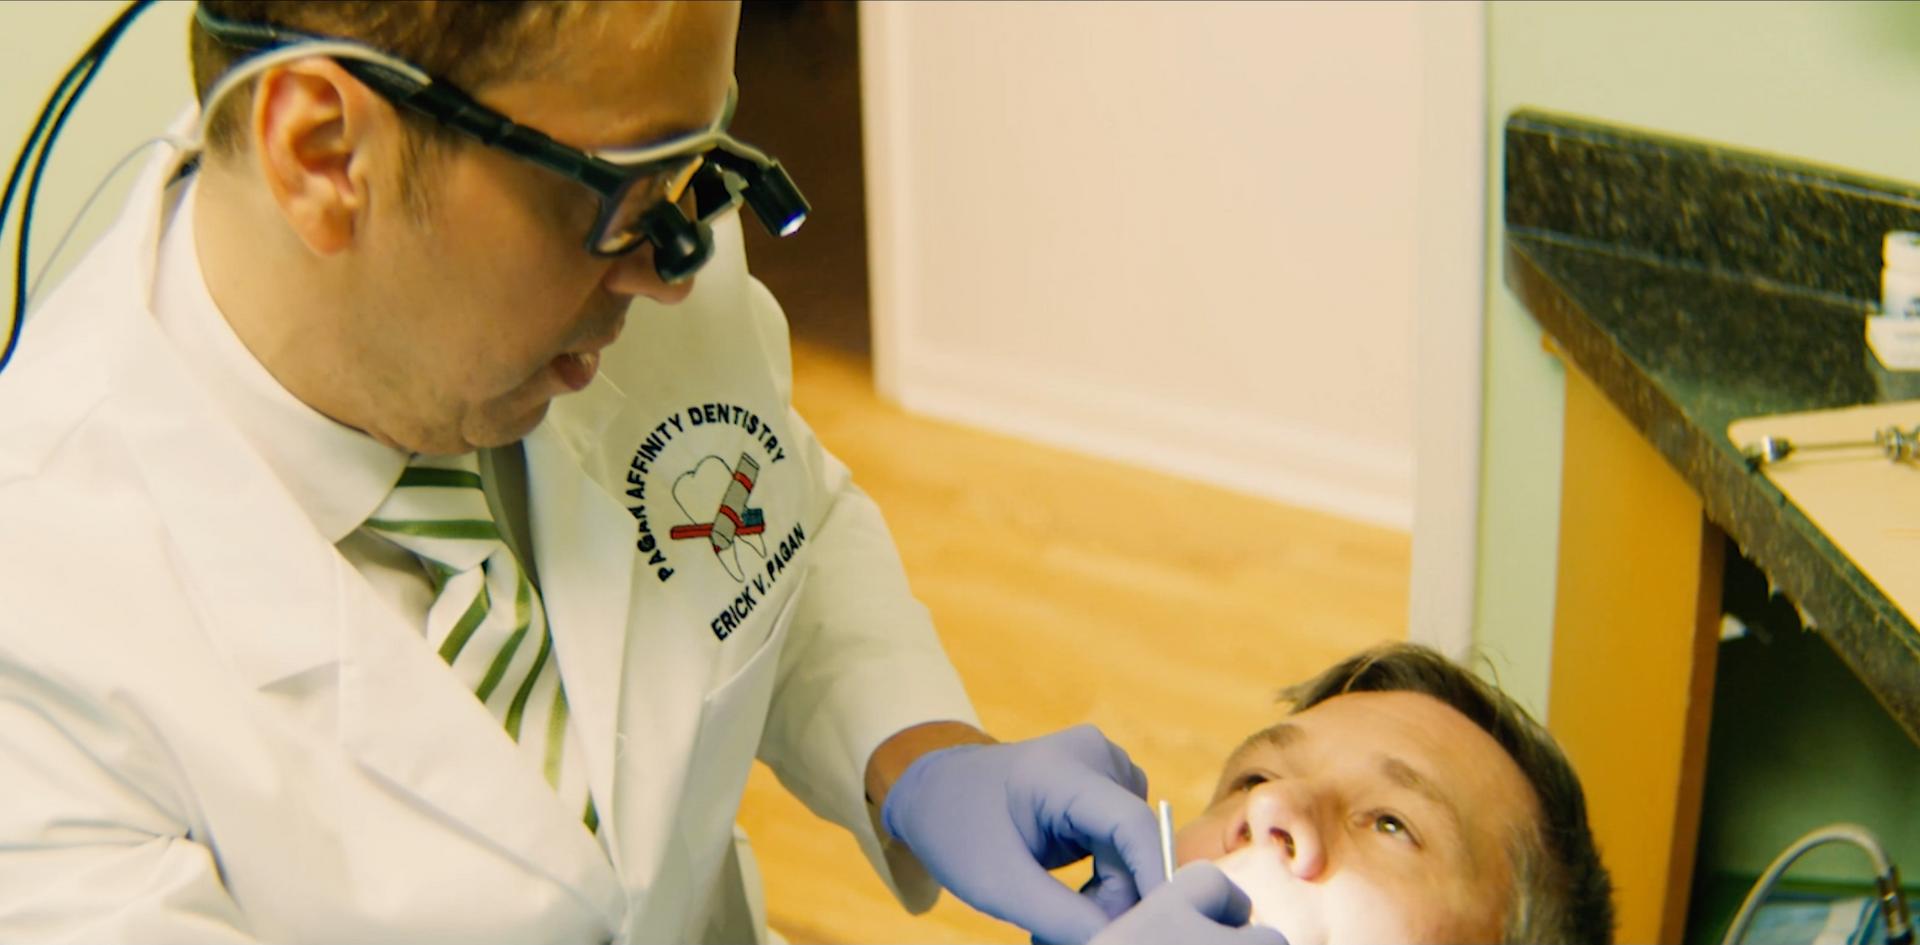 pagan dentist work.png